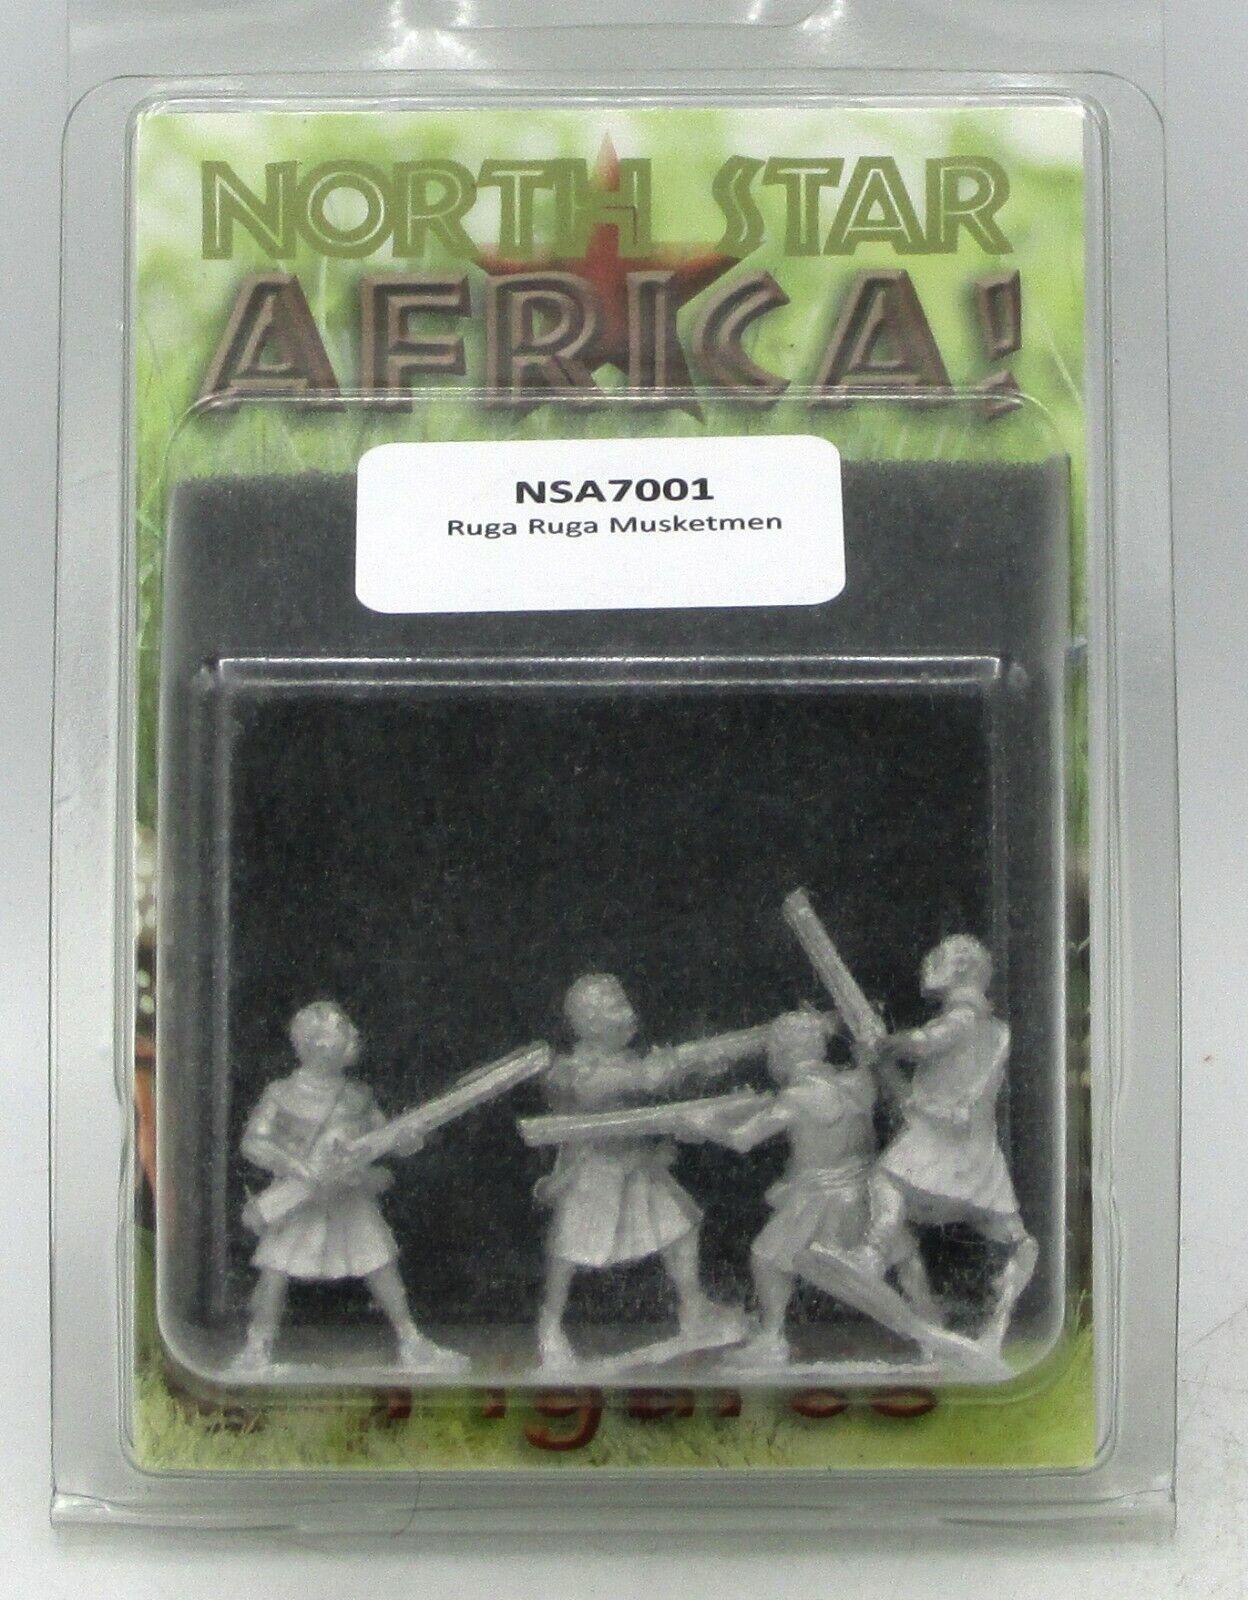 NSA7007-Ruga Ruga characters North Star Africa